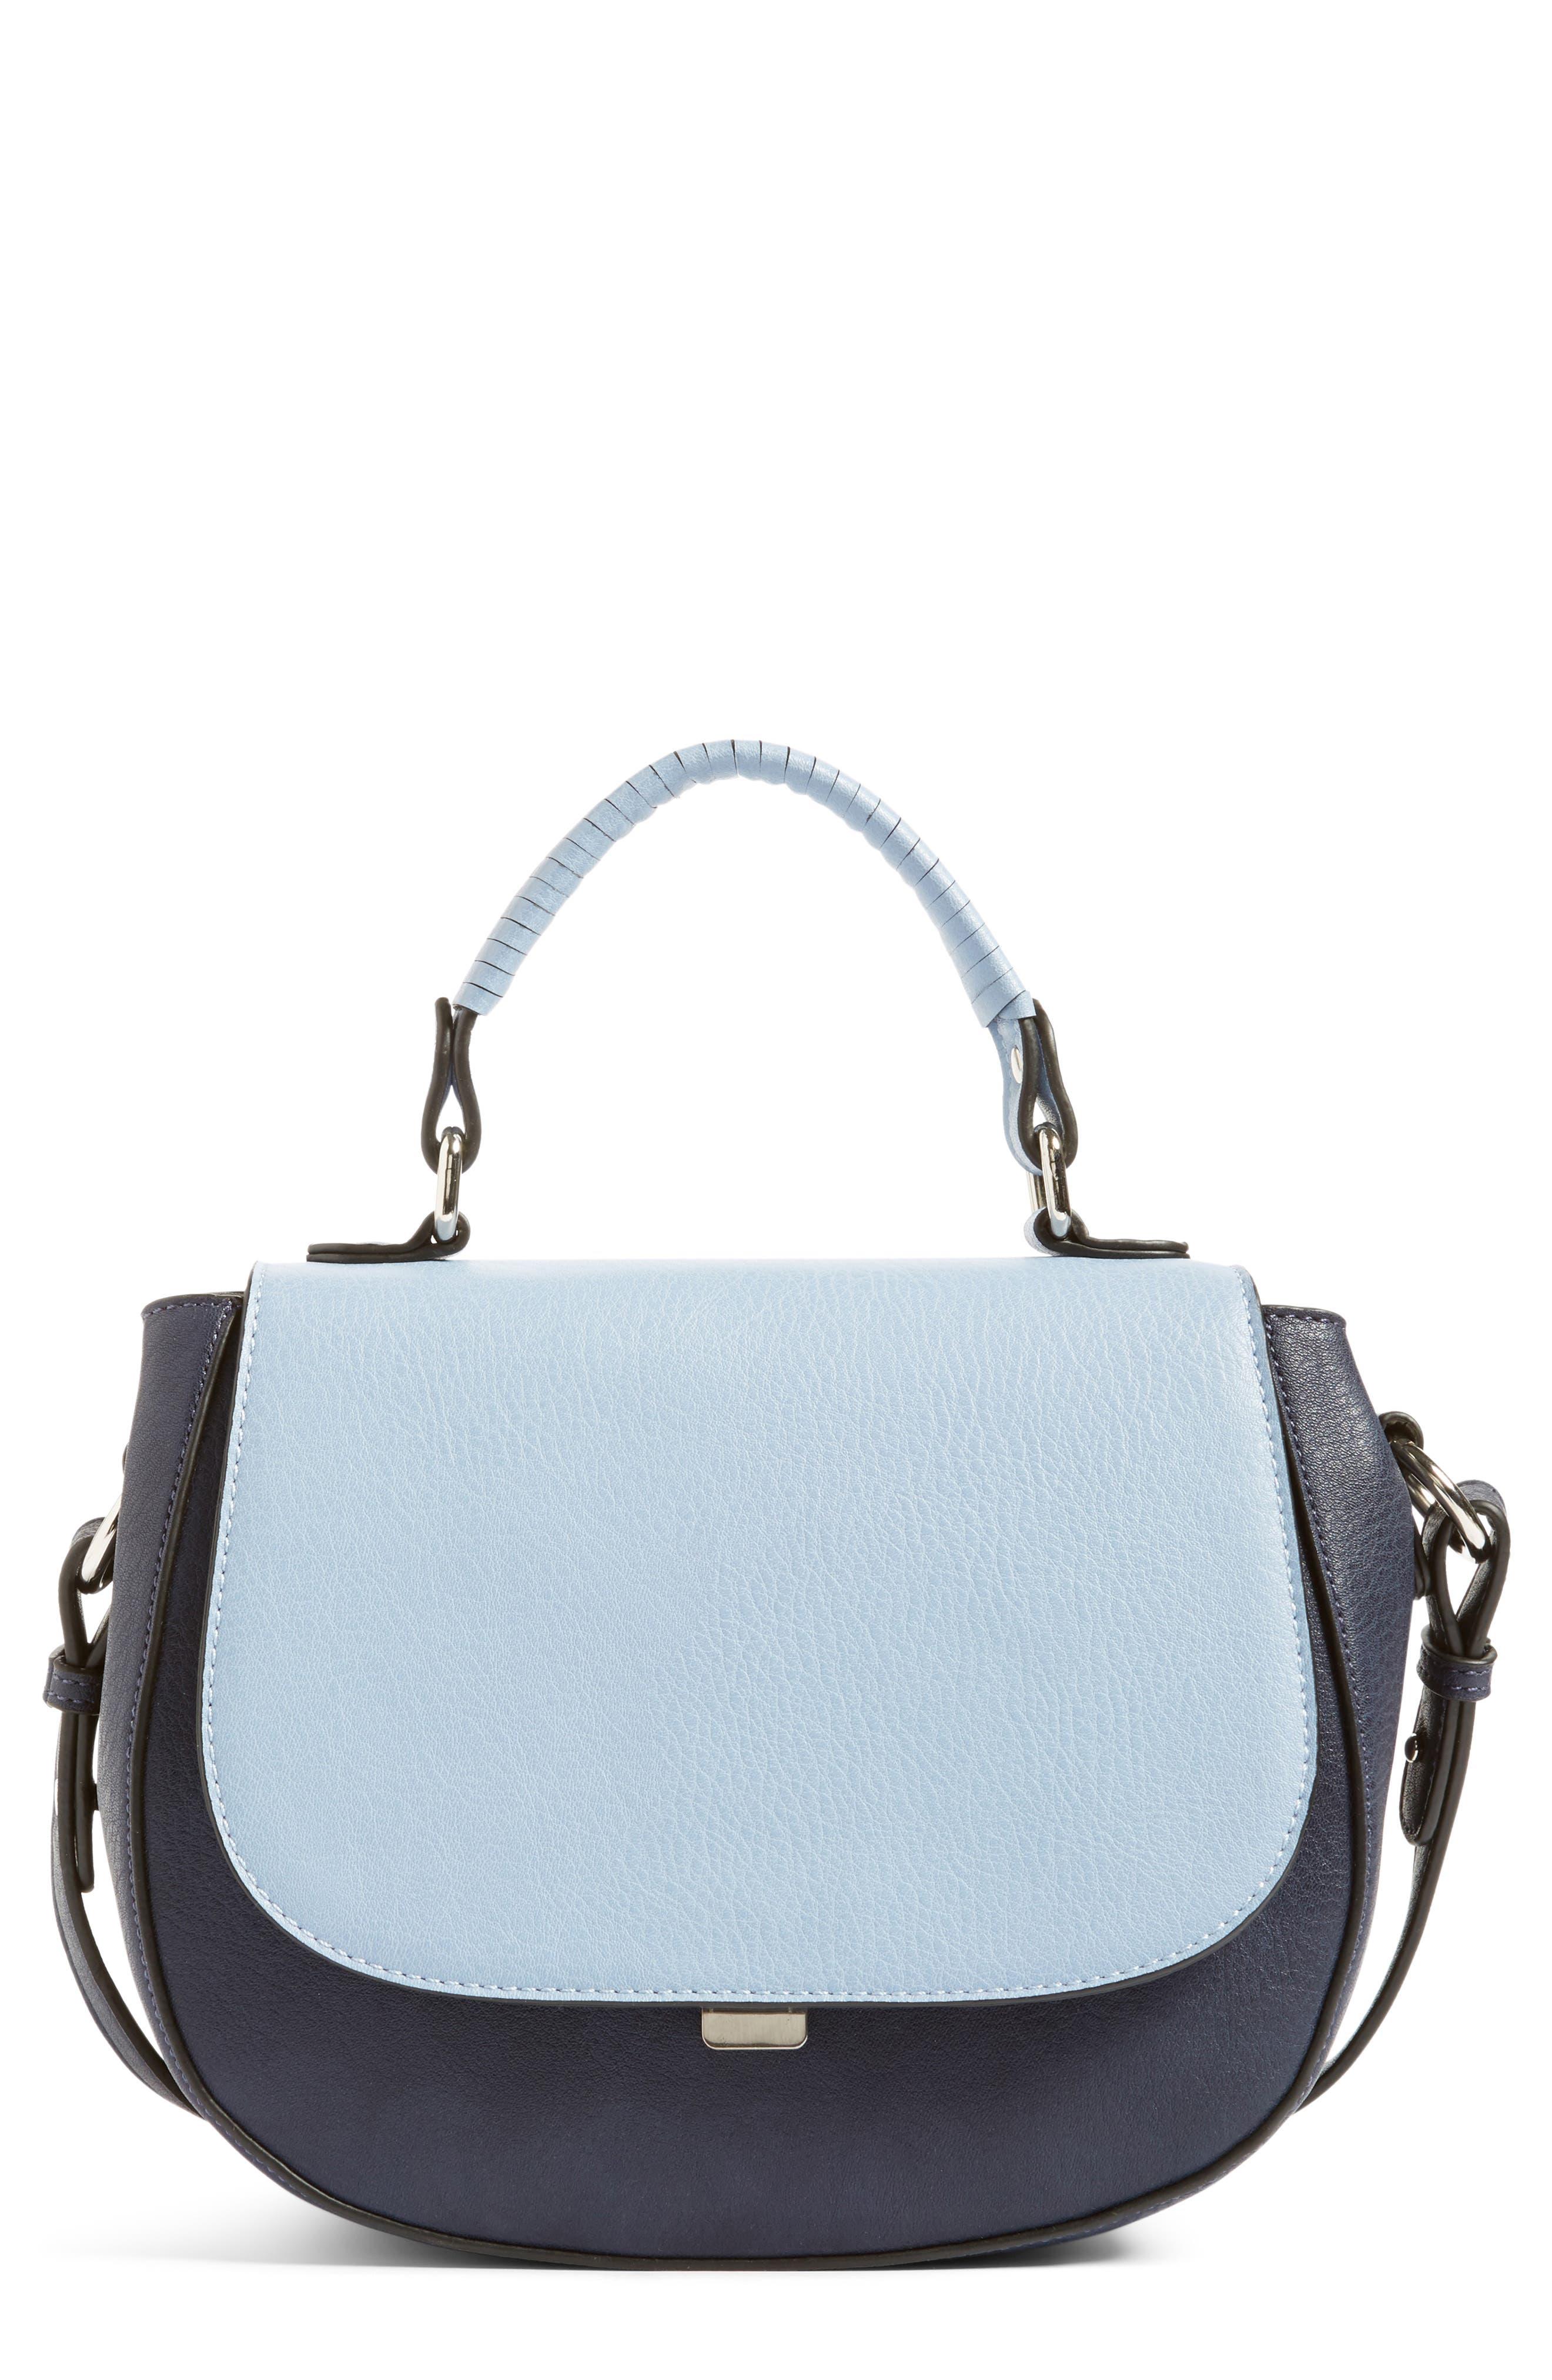 CHELSEA28 Kyle Faux Leather Saddle Bag